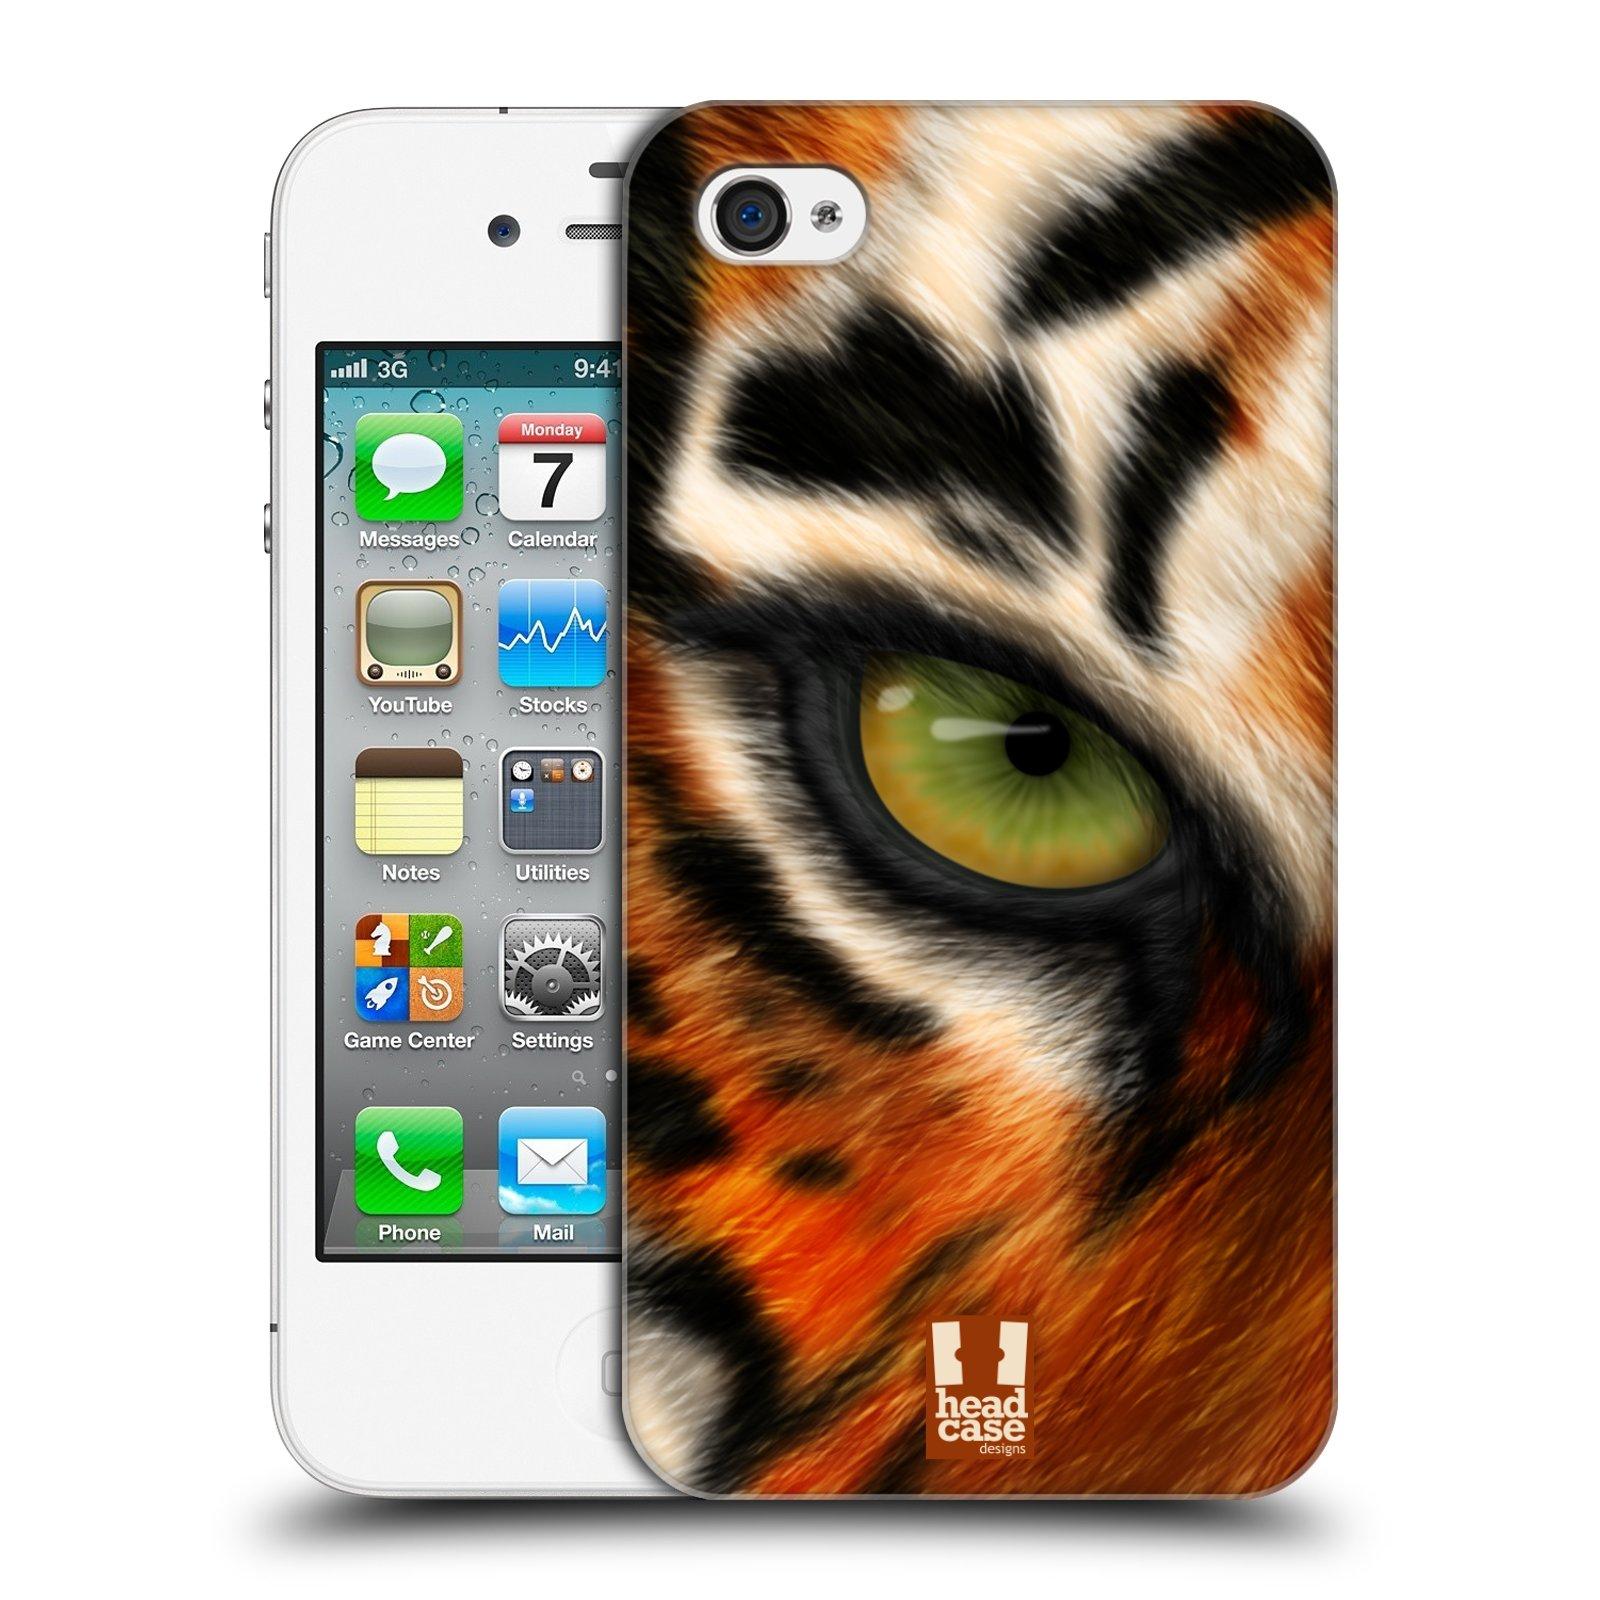 HEAD CASE plastový obal na mobil Apple Iphone 4/4S vzor pohled zvířete oko tygr